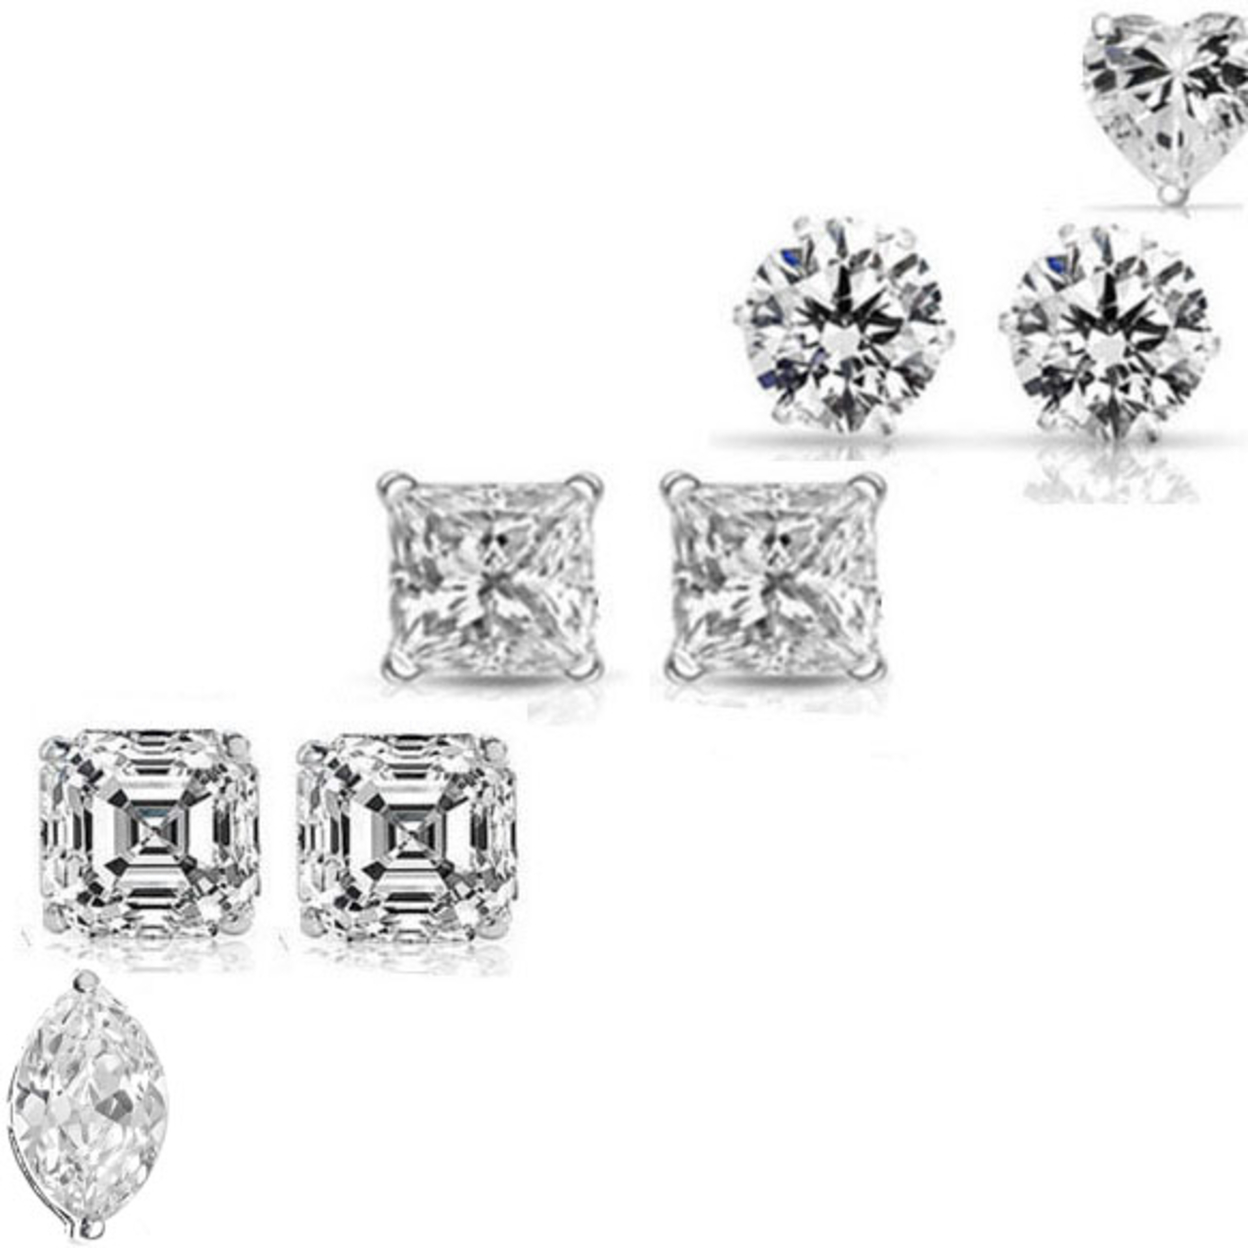 10.00 Cttw Set Of 5 Swarovski Elements Crystal Studs In Sterling Silver